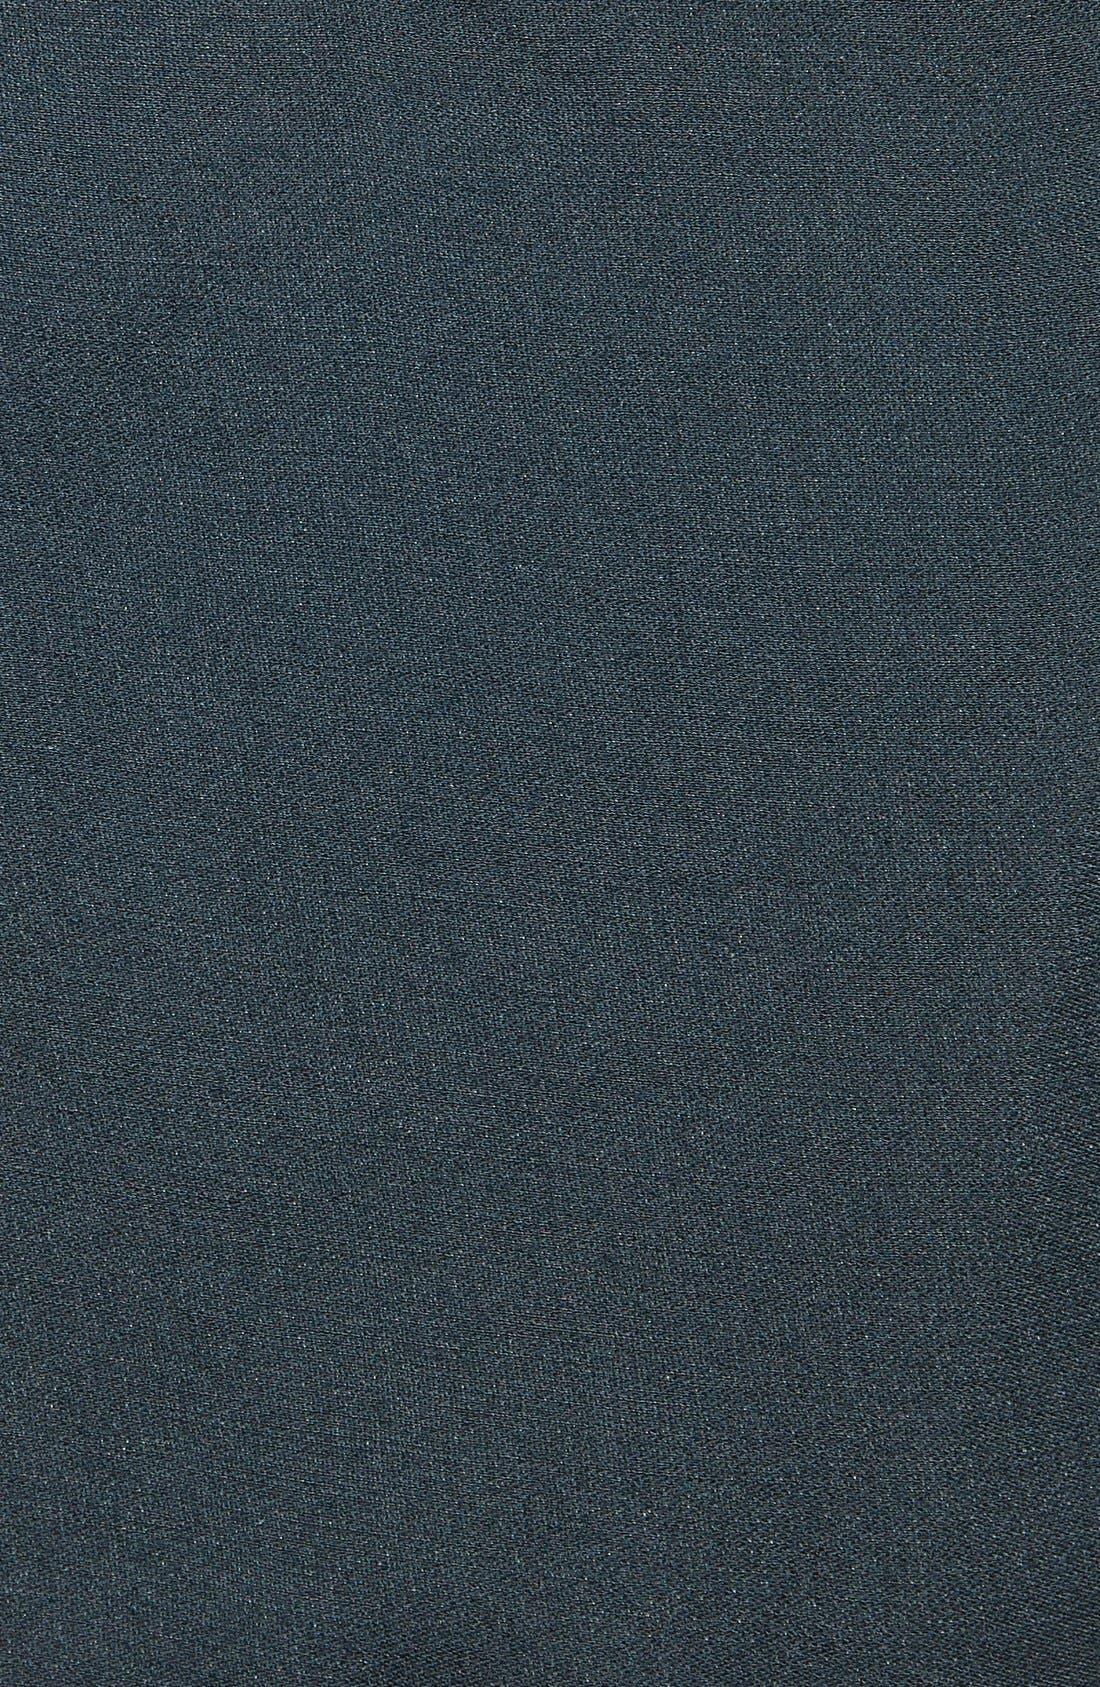 Alternate Image 3  - Helmut Lang 'Flash' Draped Crop Pants